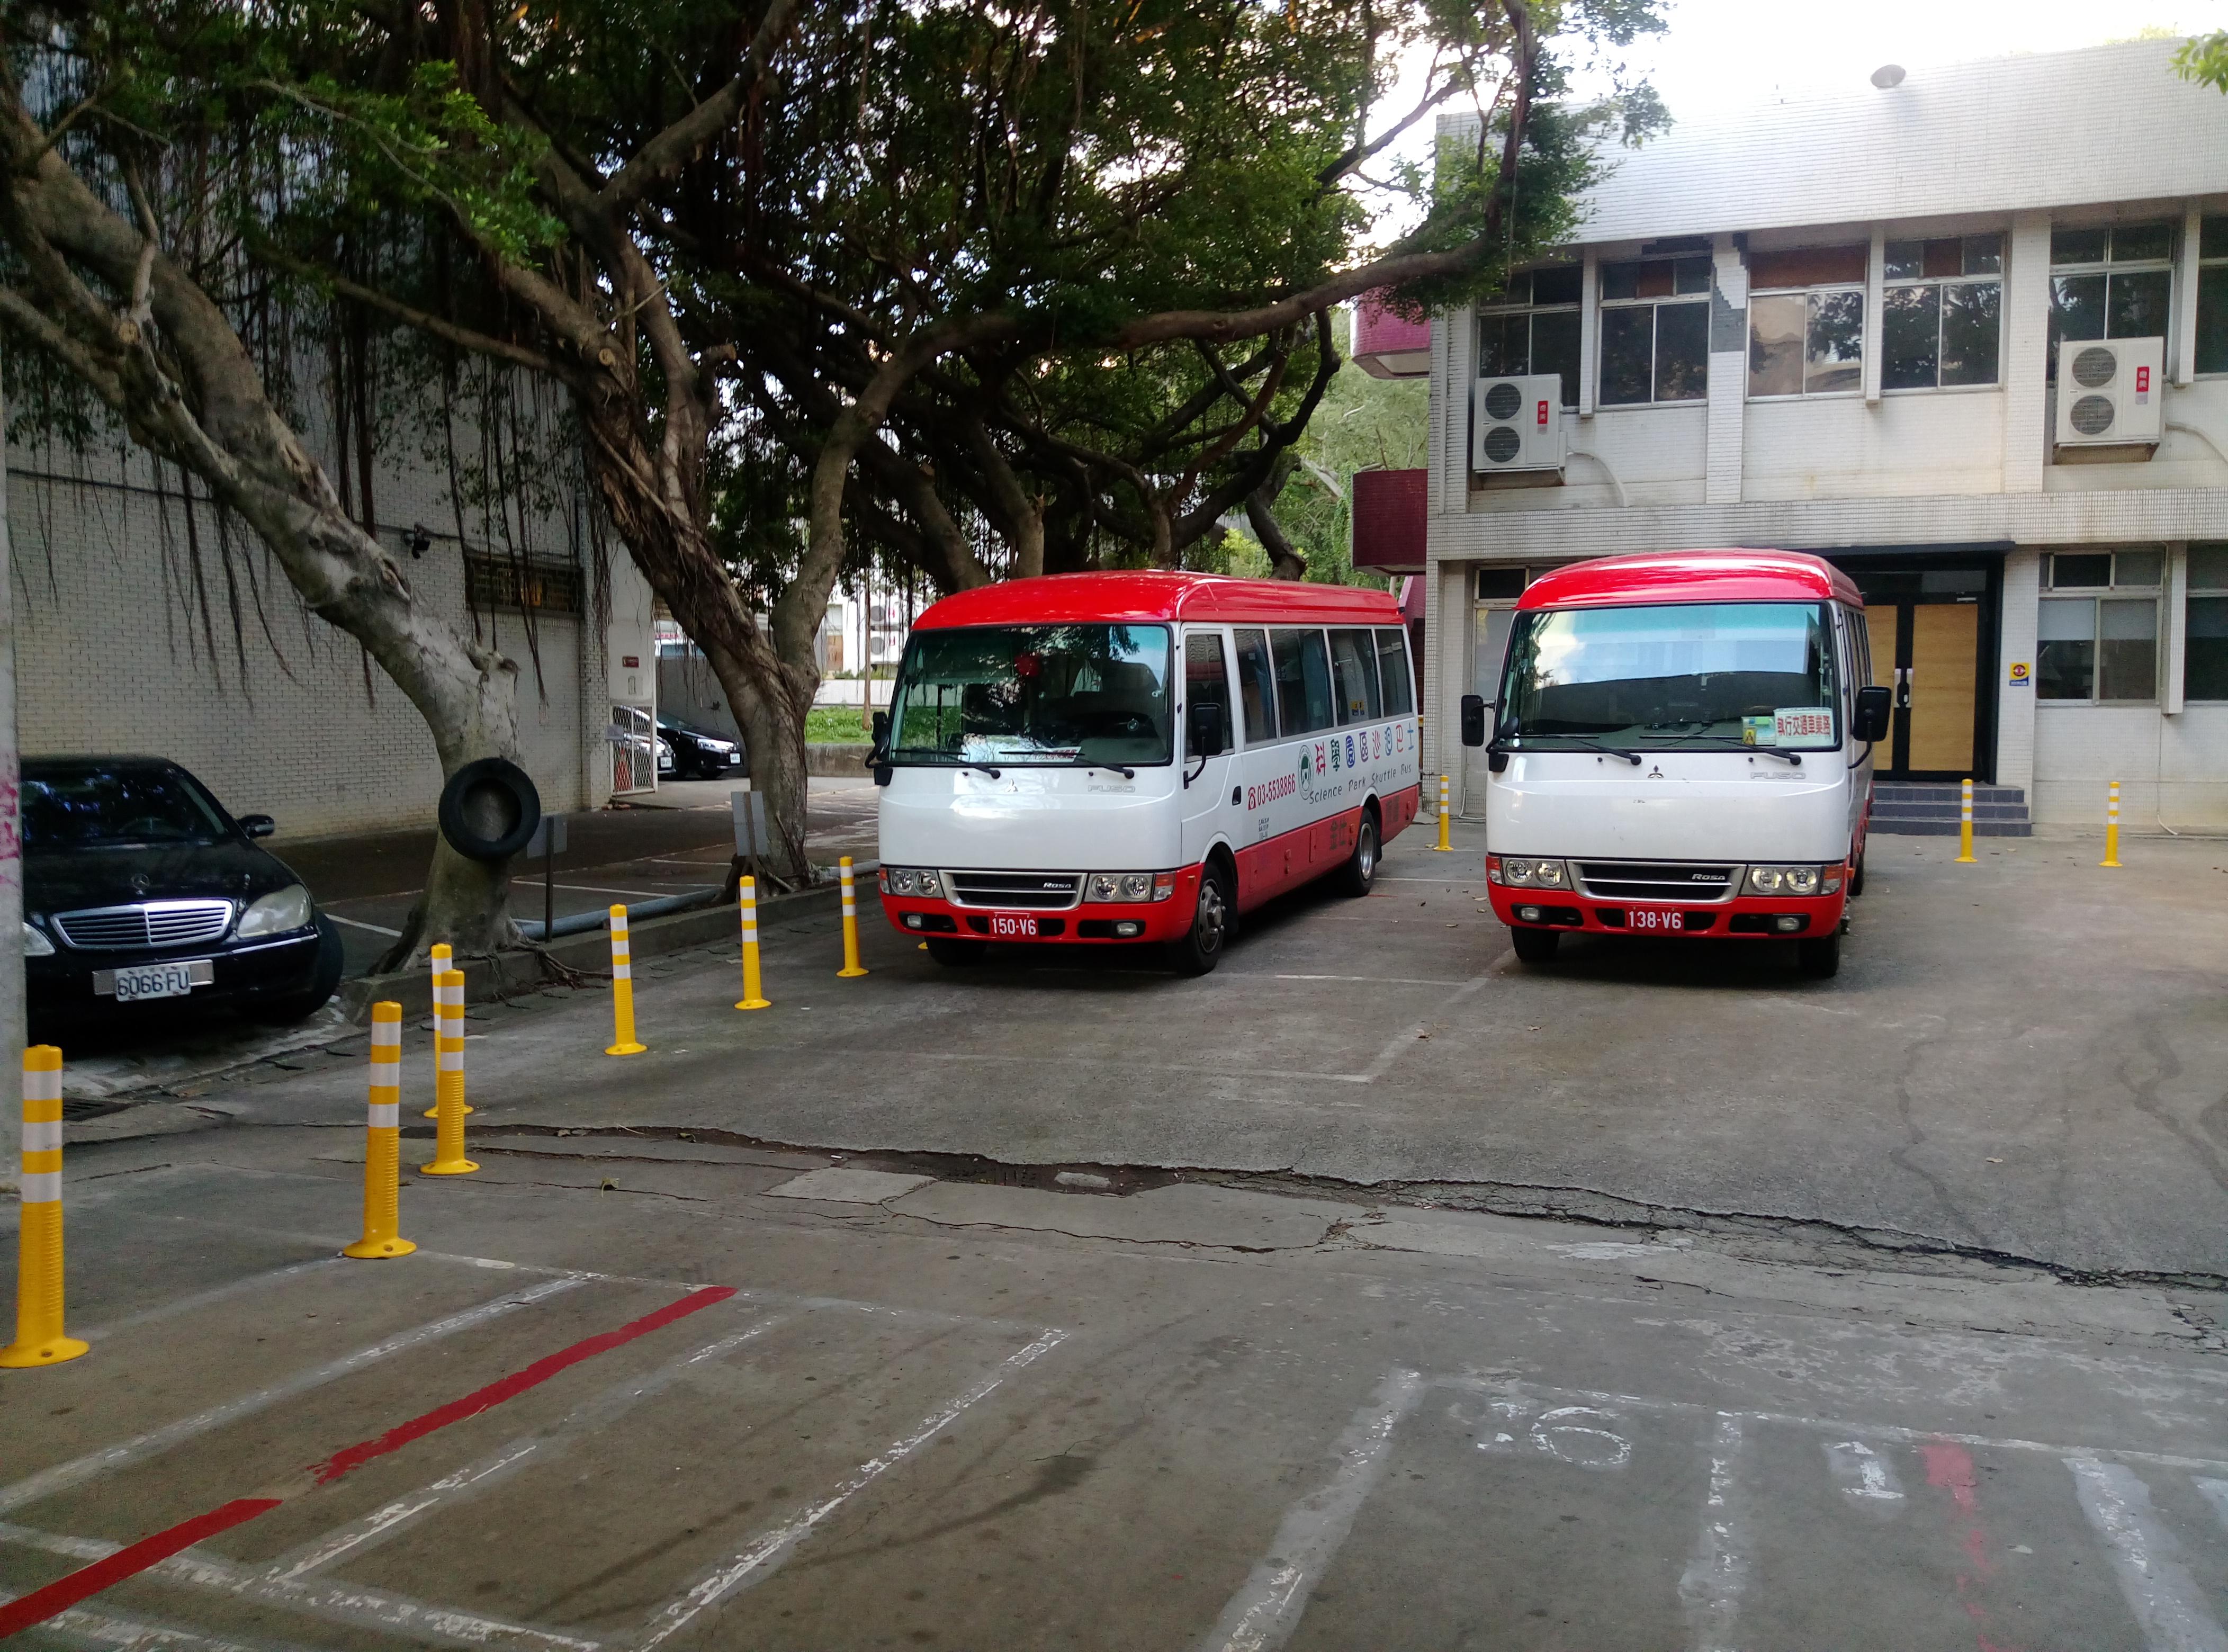 File:Hsinchu Science Park Shuttle Bus 150-V6 138-V6 20180126a jpg